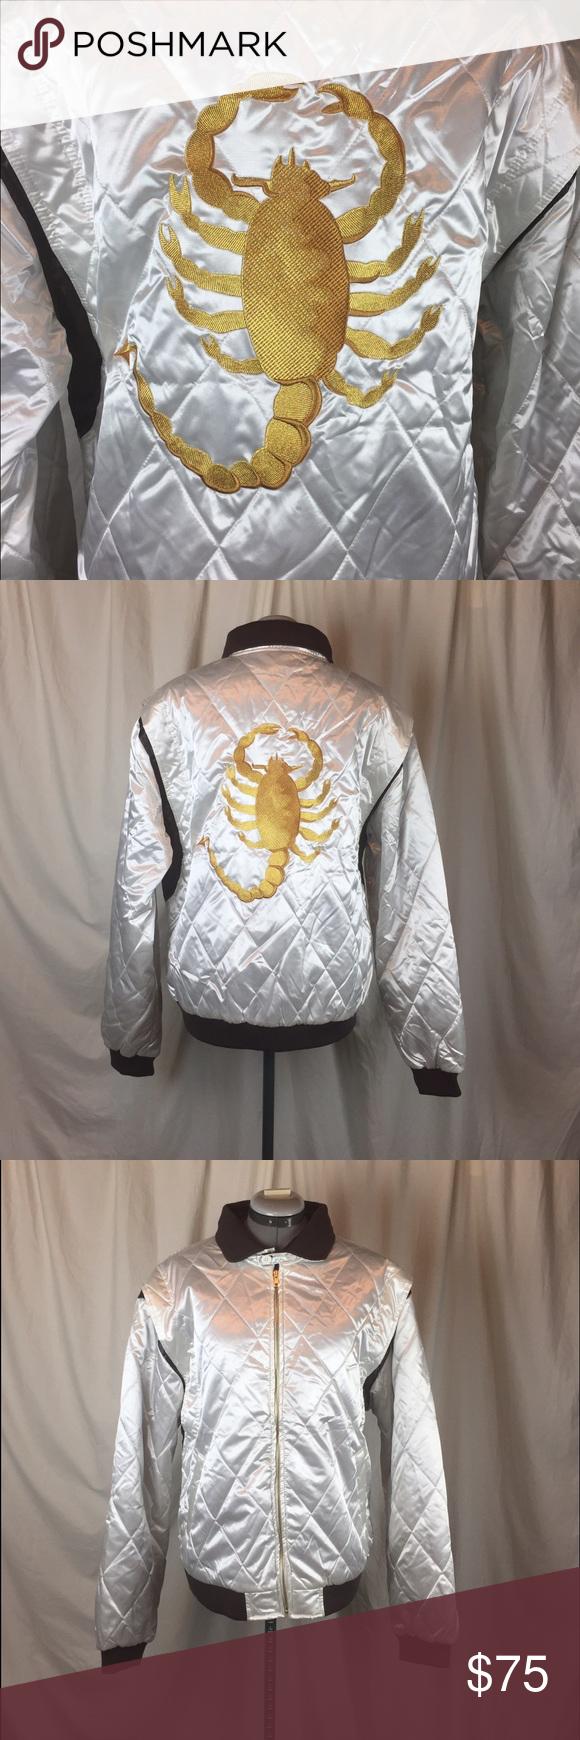 White Scorpion Drive Bomber Jacket Brown Bomber Jacket Bomber Jacket Clothes Design [ 1740 x 580 Pixel ]